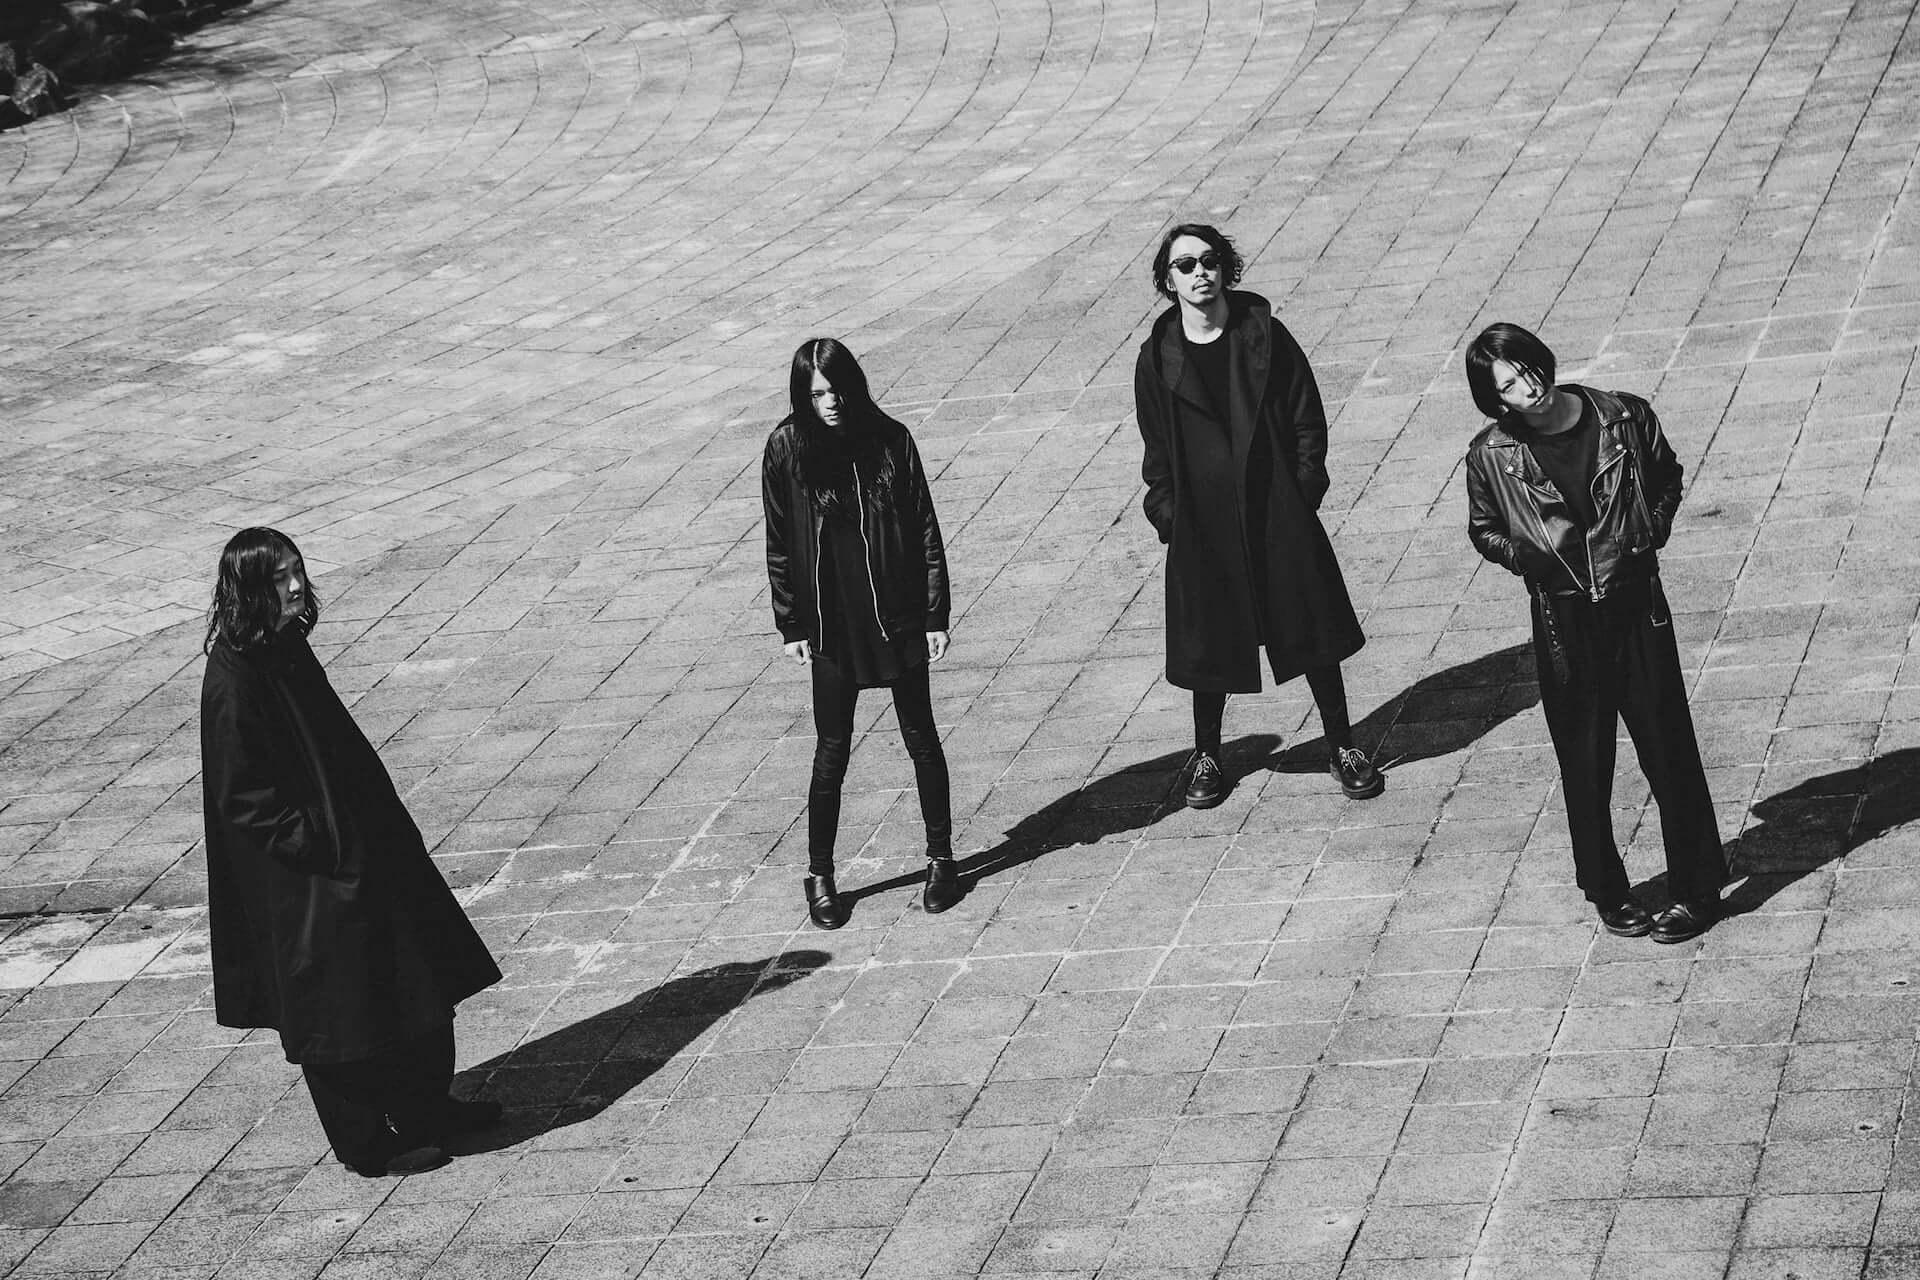 THE NOVEMBERSが最新アルバム『ANGELS』を通して語る、今の姿 interview-the-novembers-1-1920x1280